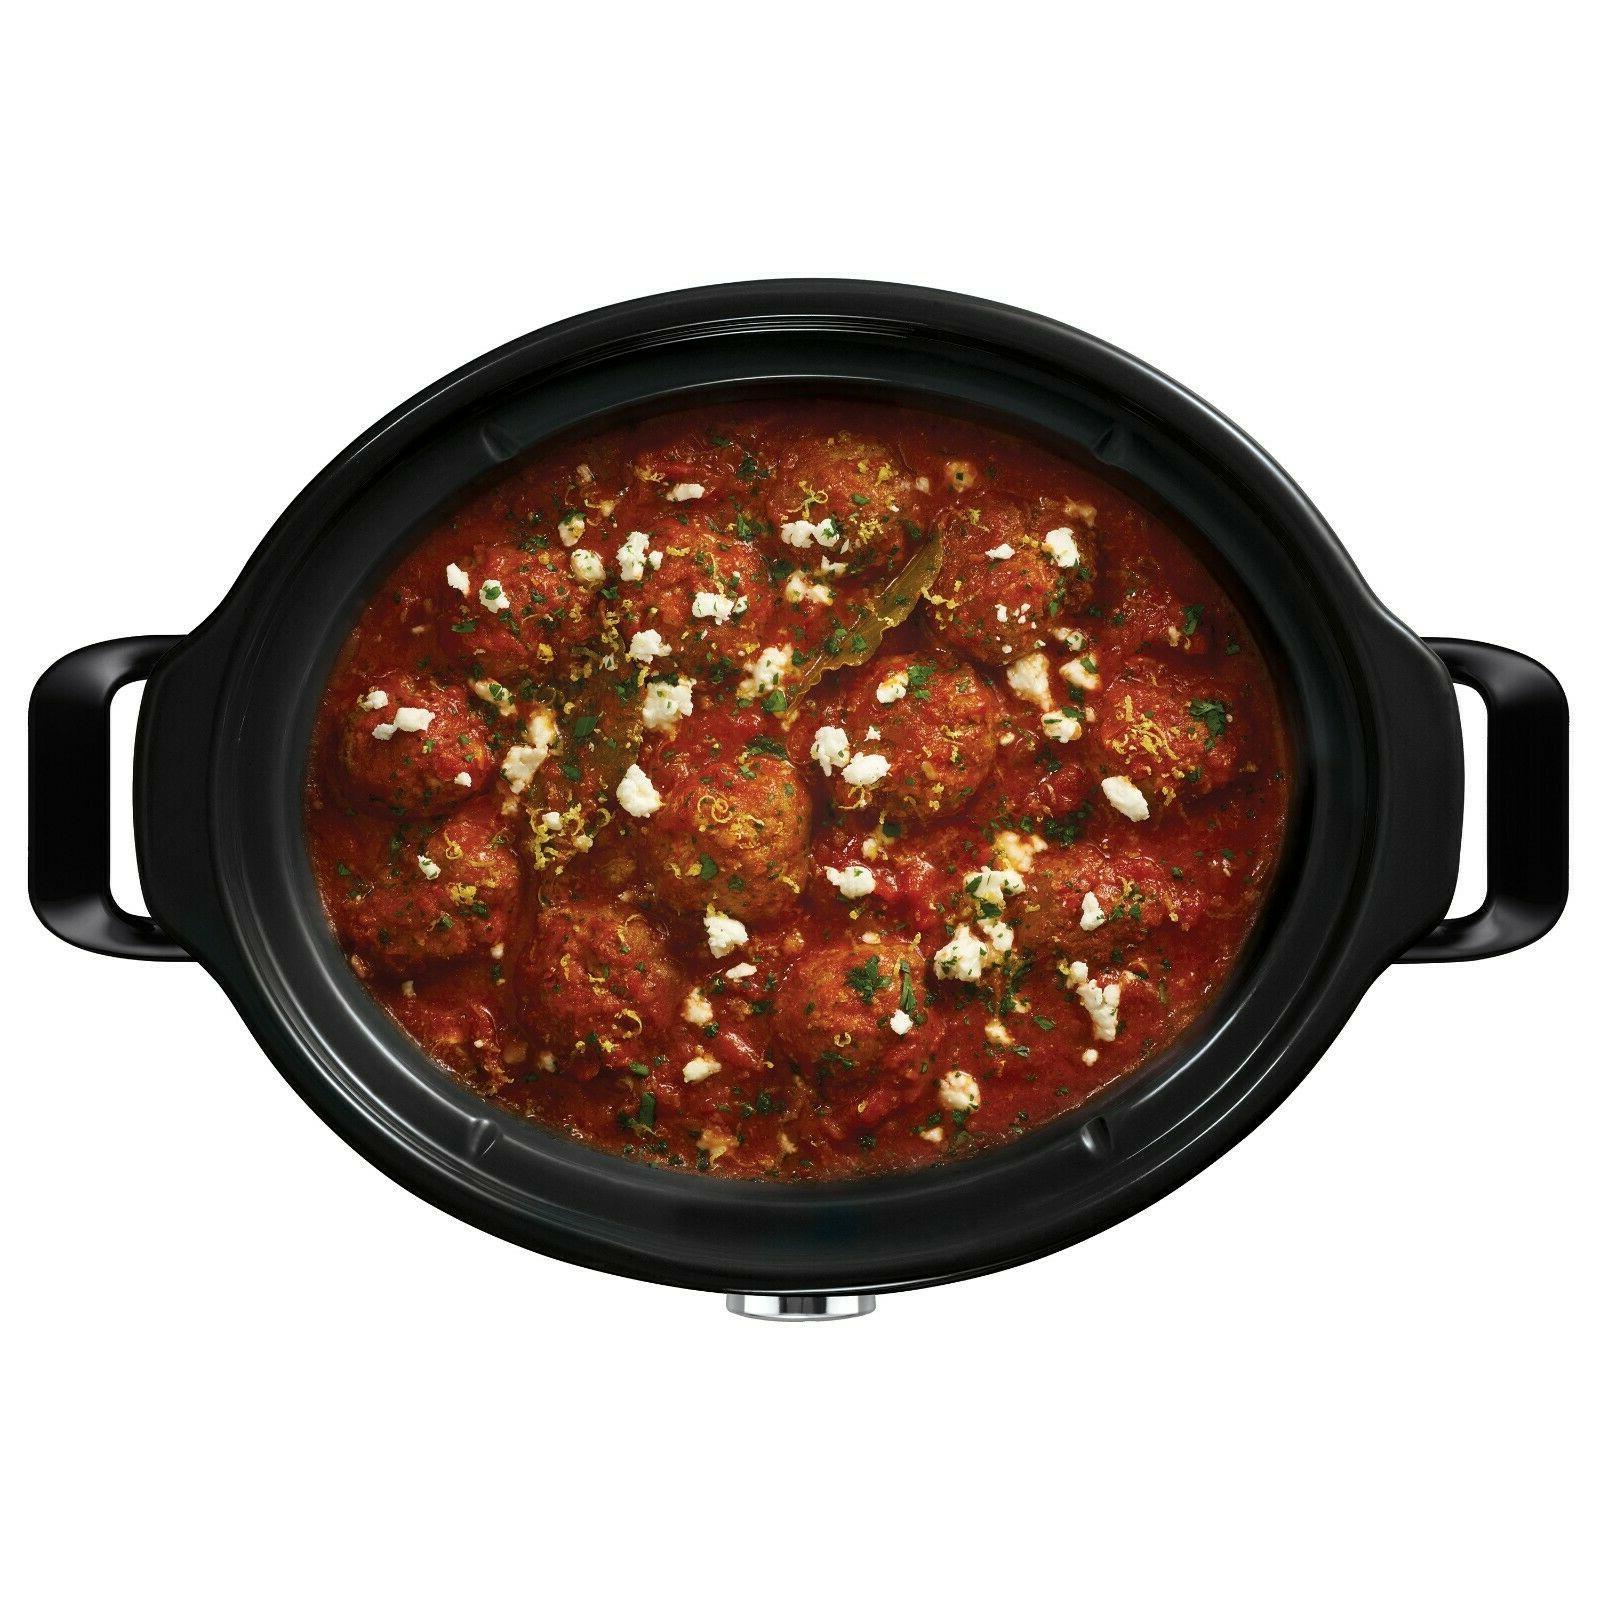 Crock-Pot 4 Cooker